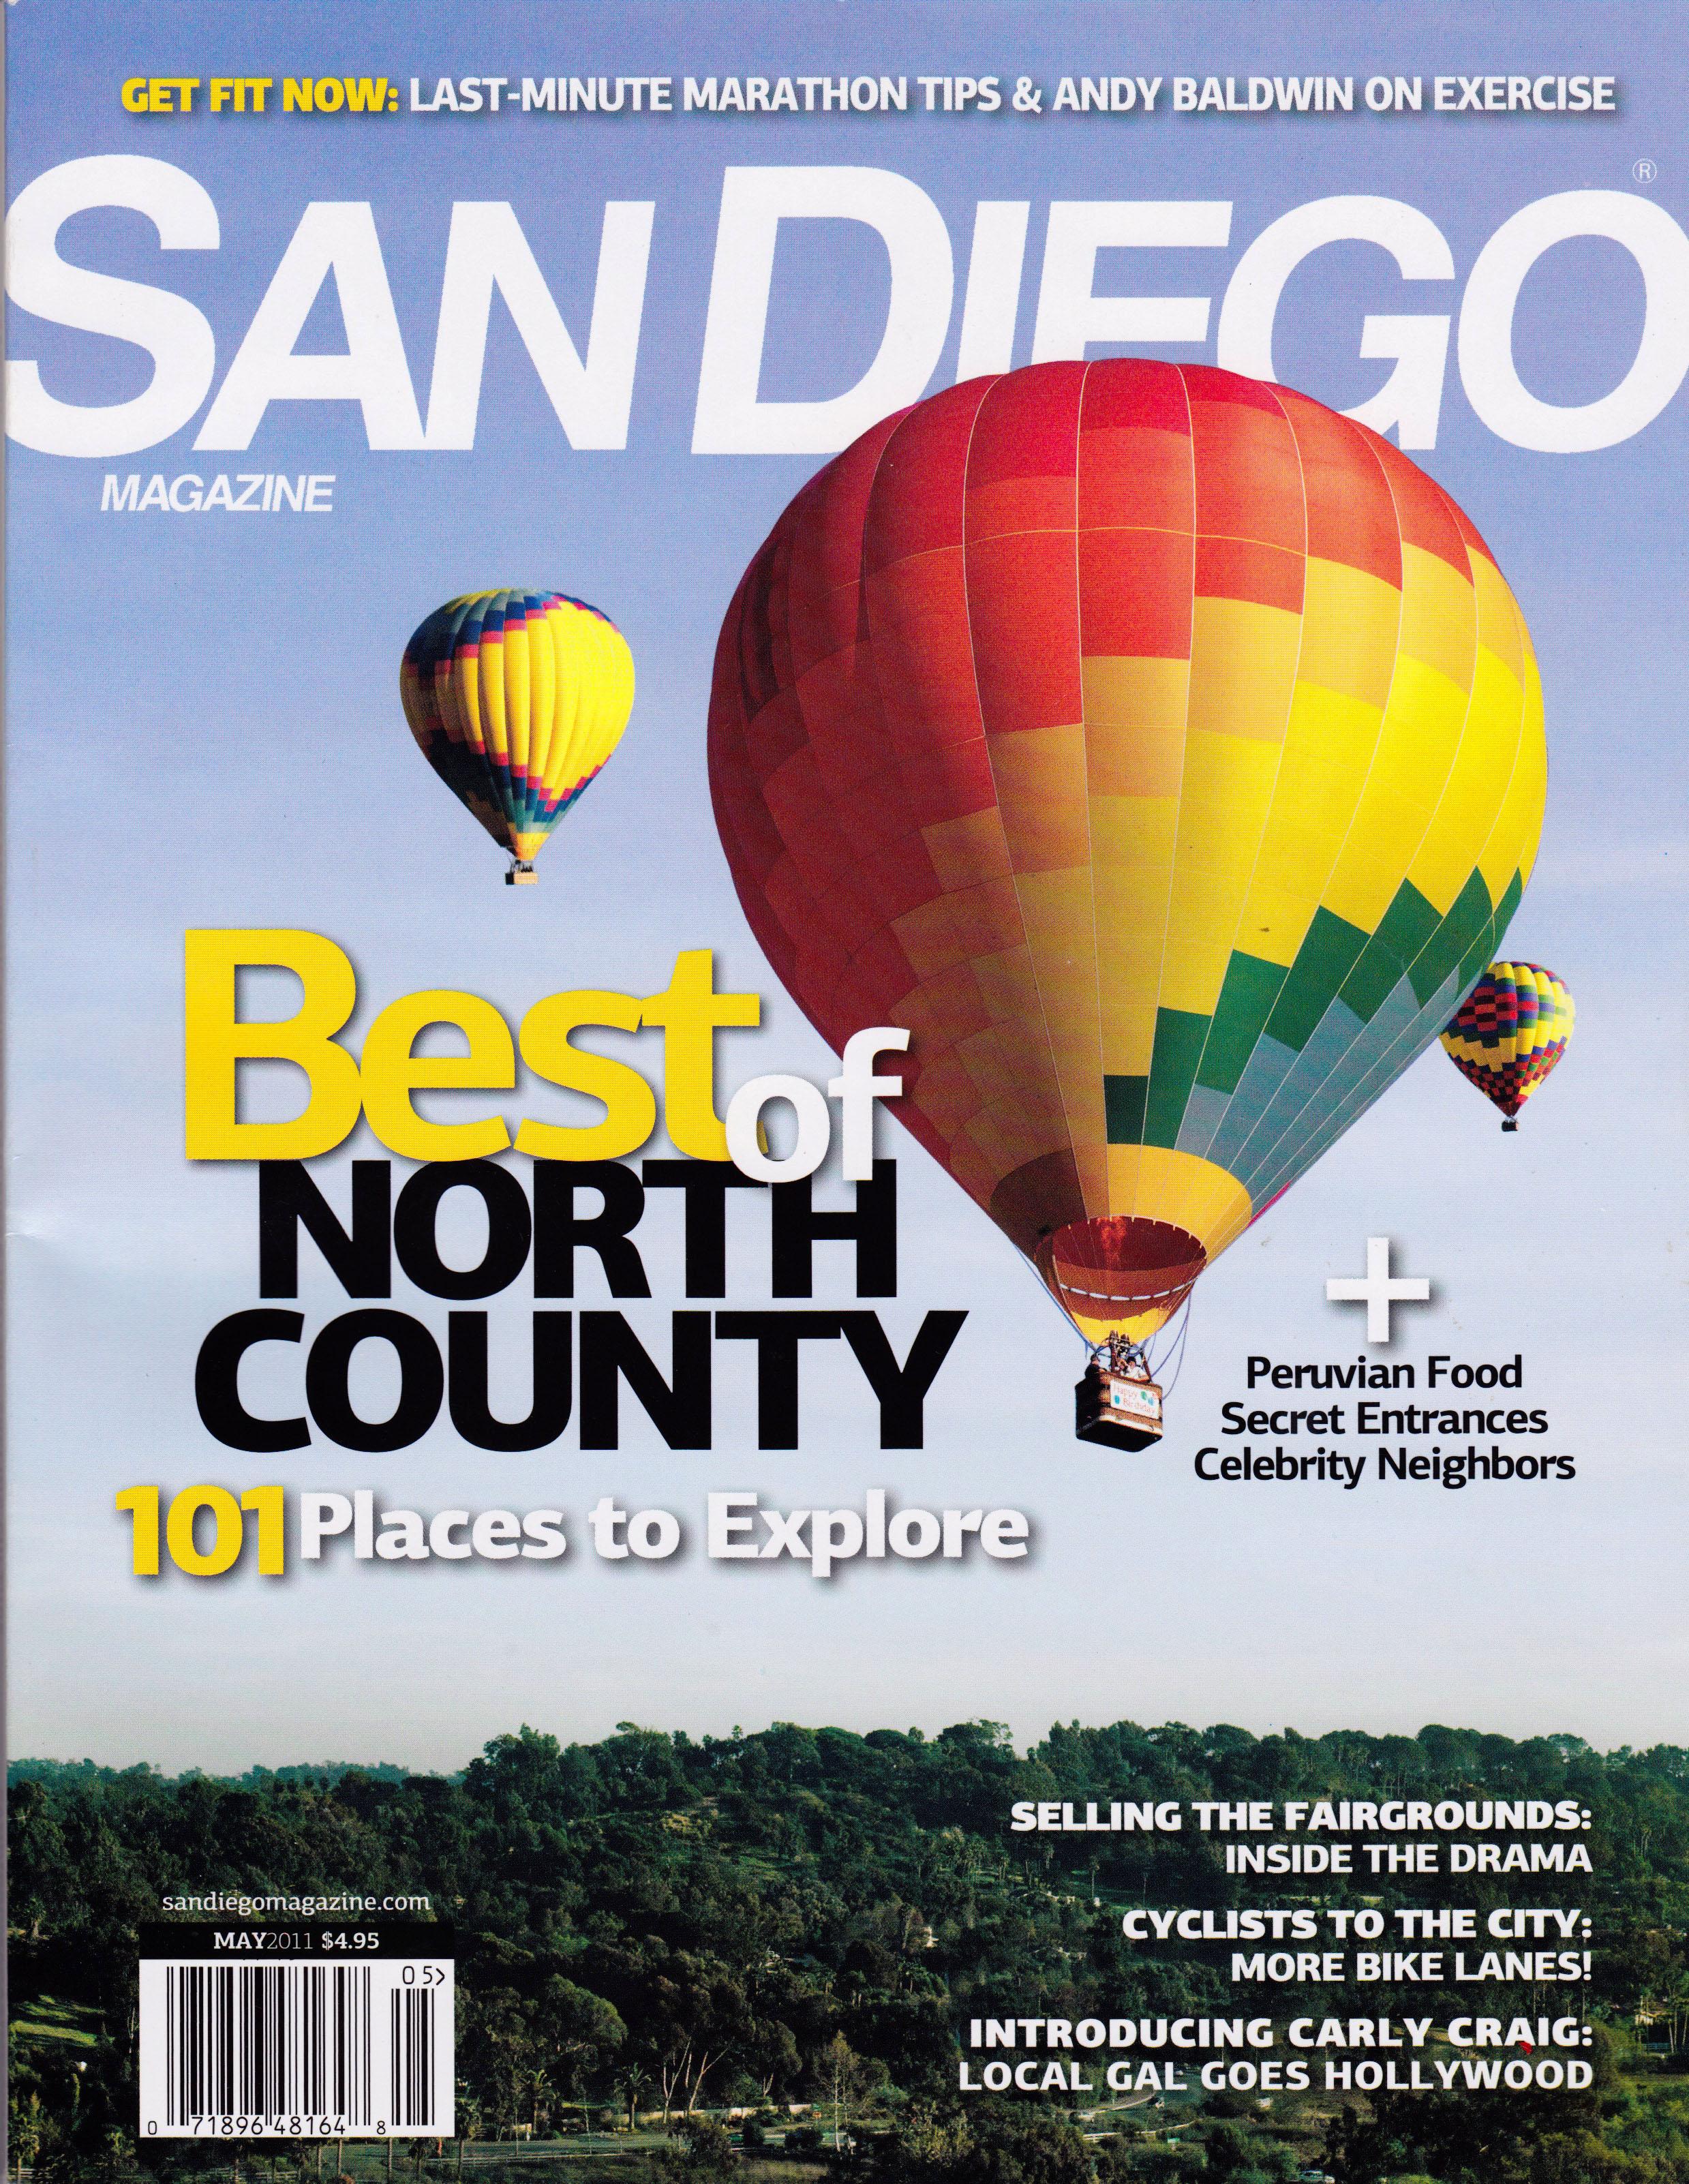 SDM_May 2011 Cover.jpeg